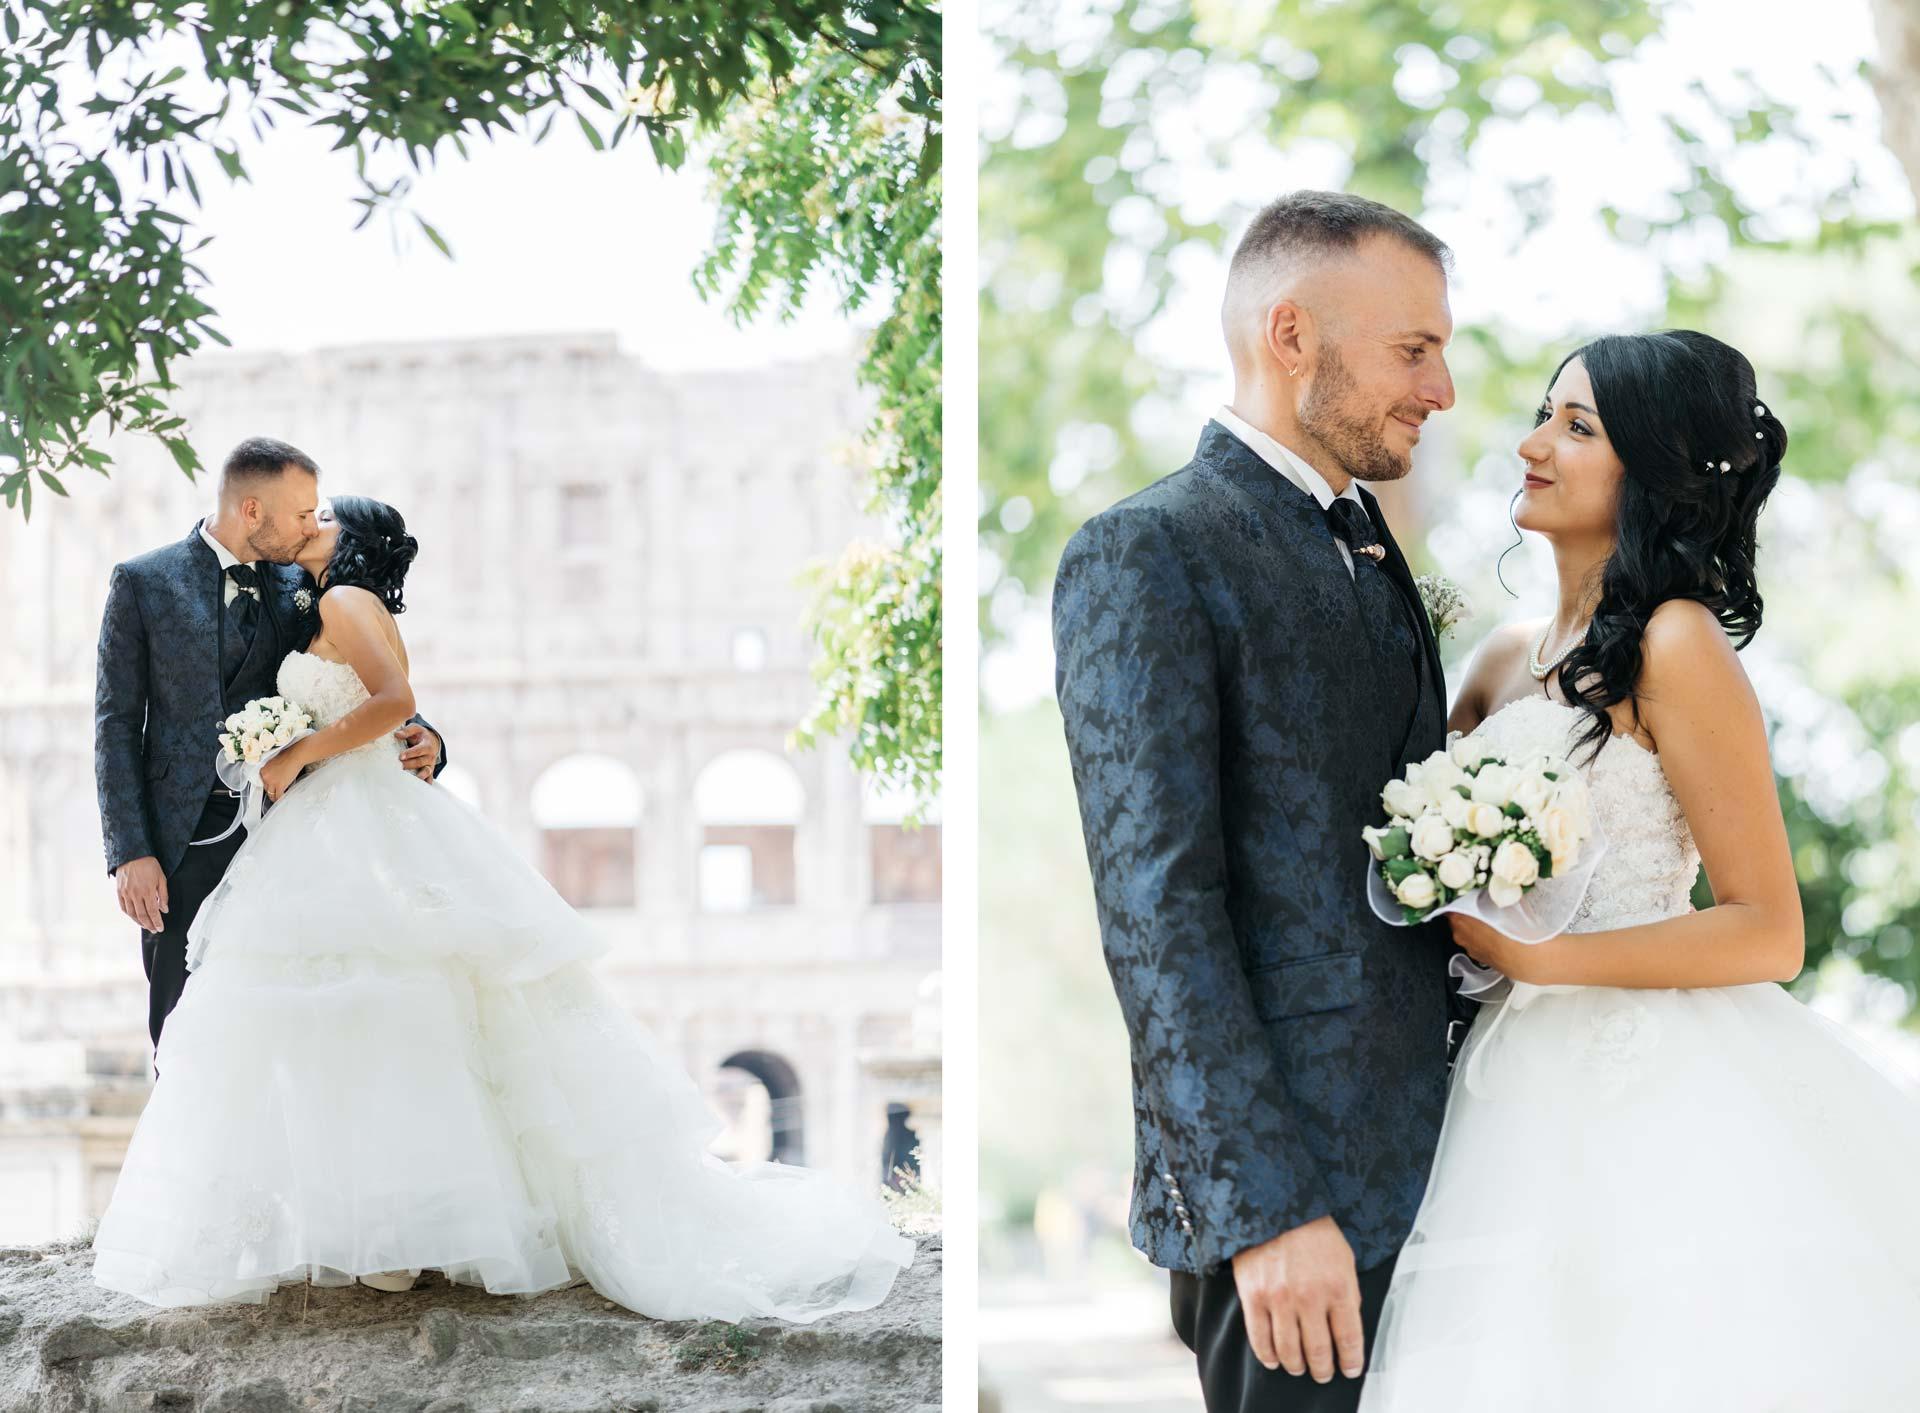 fotografo-matrimonio-reportage-roma-2-simone-nunzi